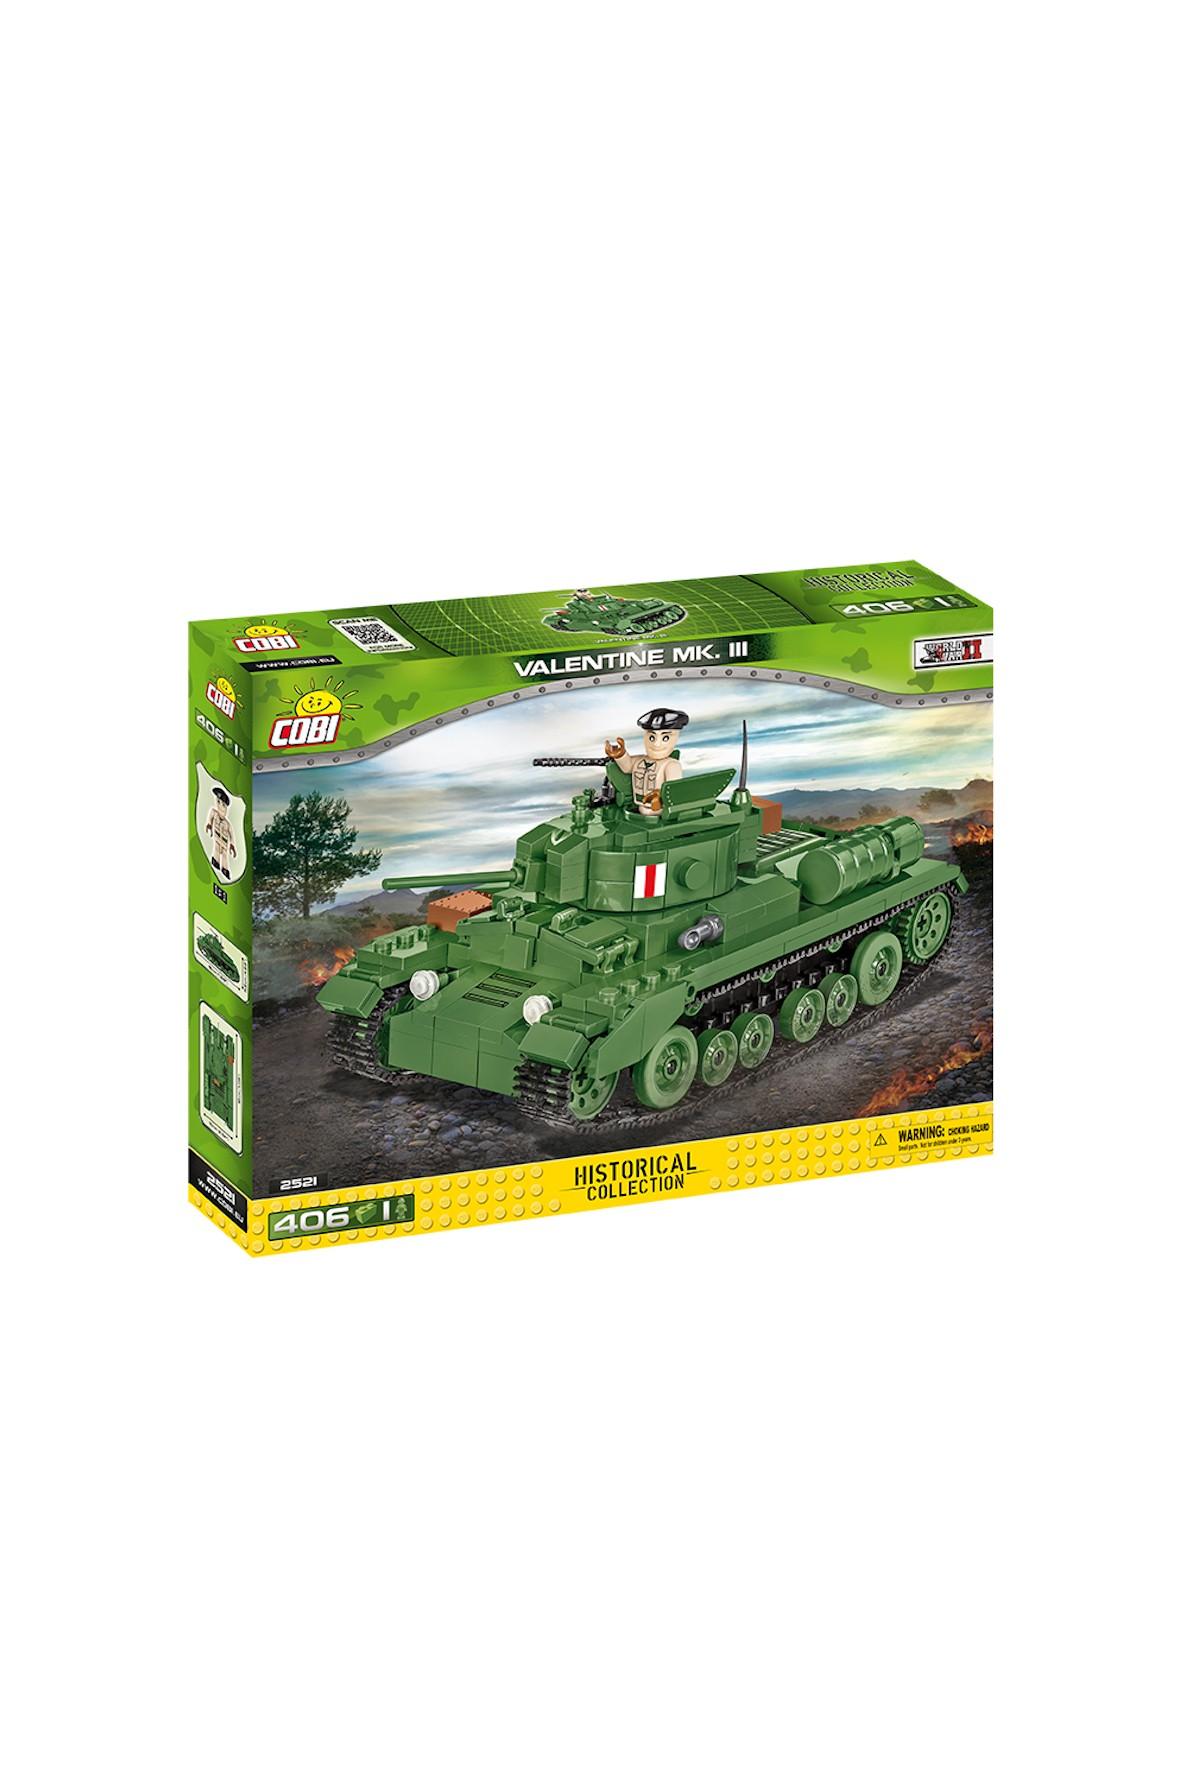 Klocki Cobi Small Army Ainfantry Tank MKIII Valeritin 406el